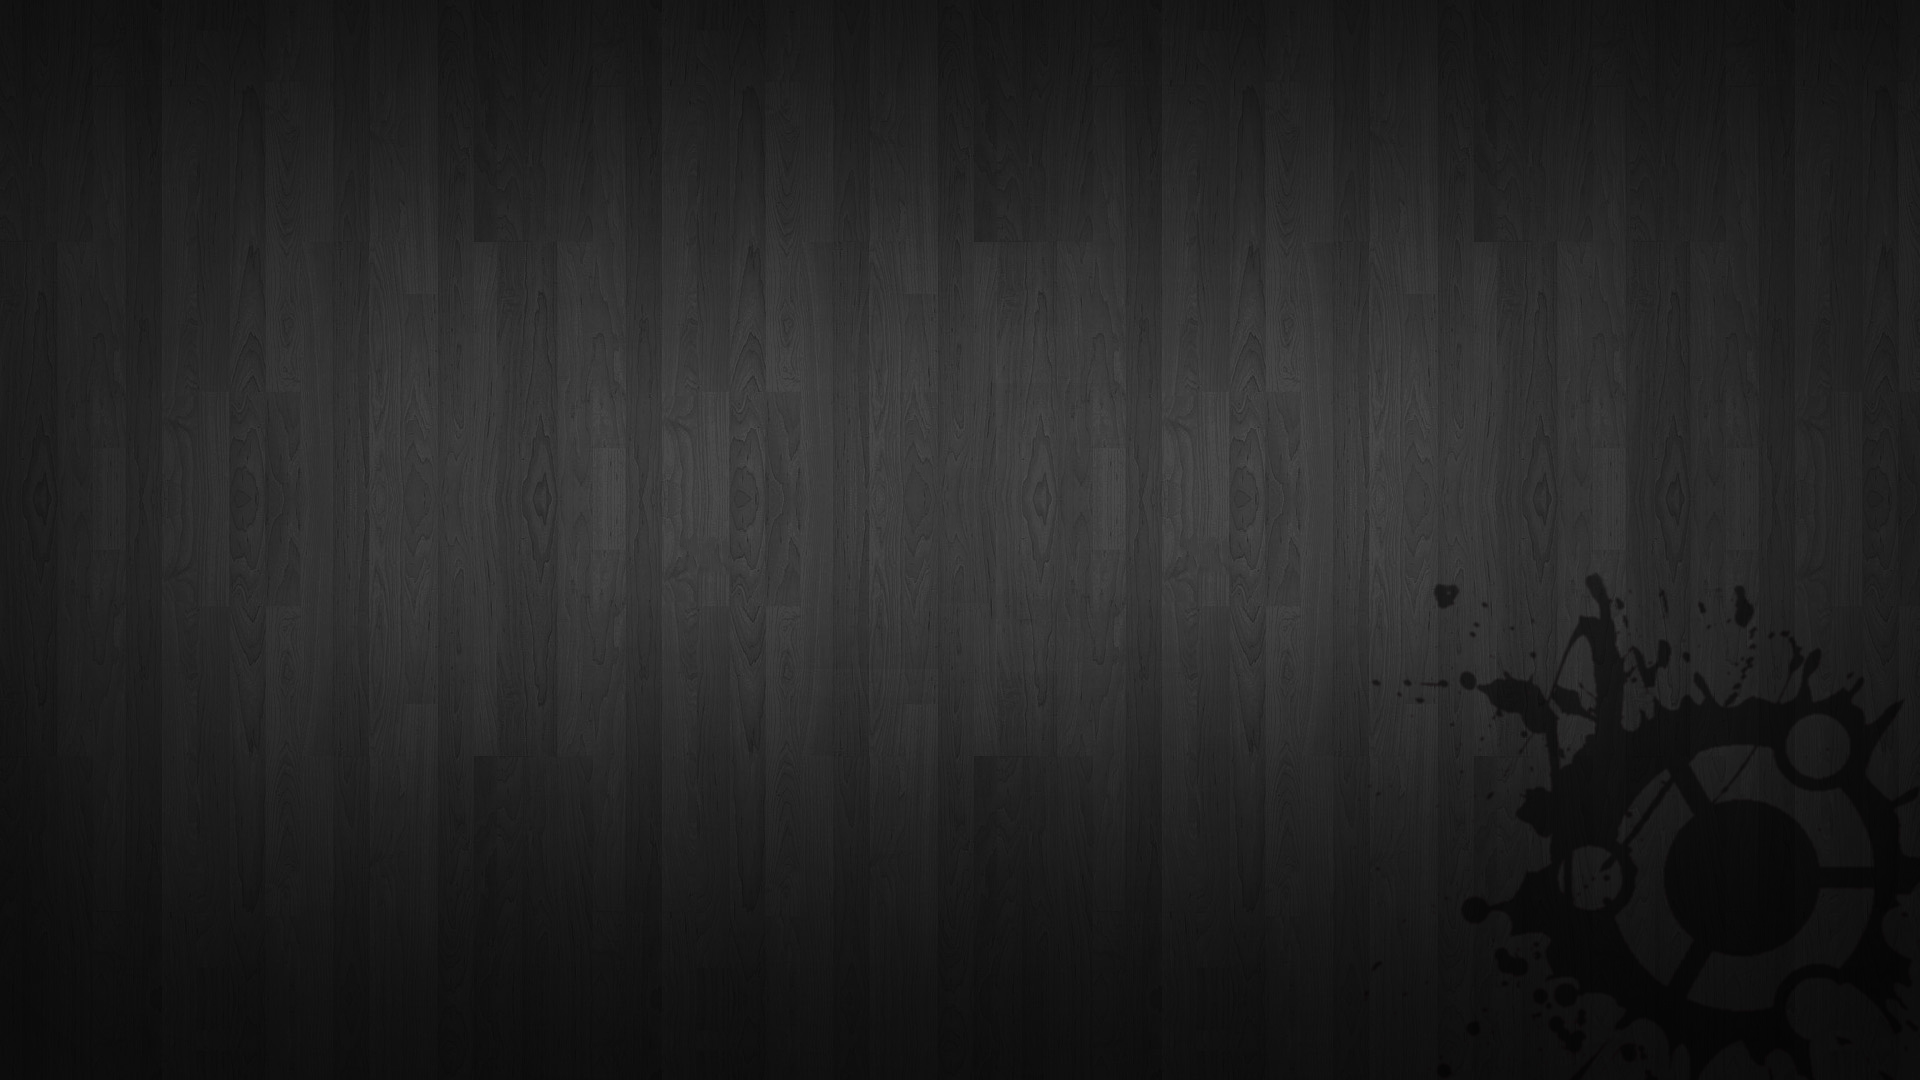 Wood Wallpaper 1920X1080 wallpaper   627153 1920x1080